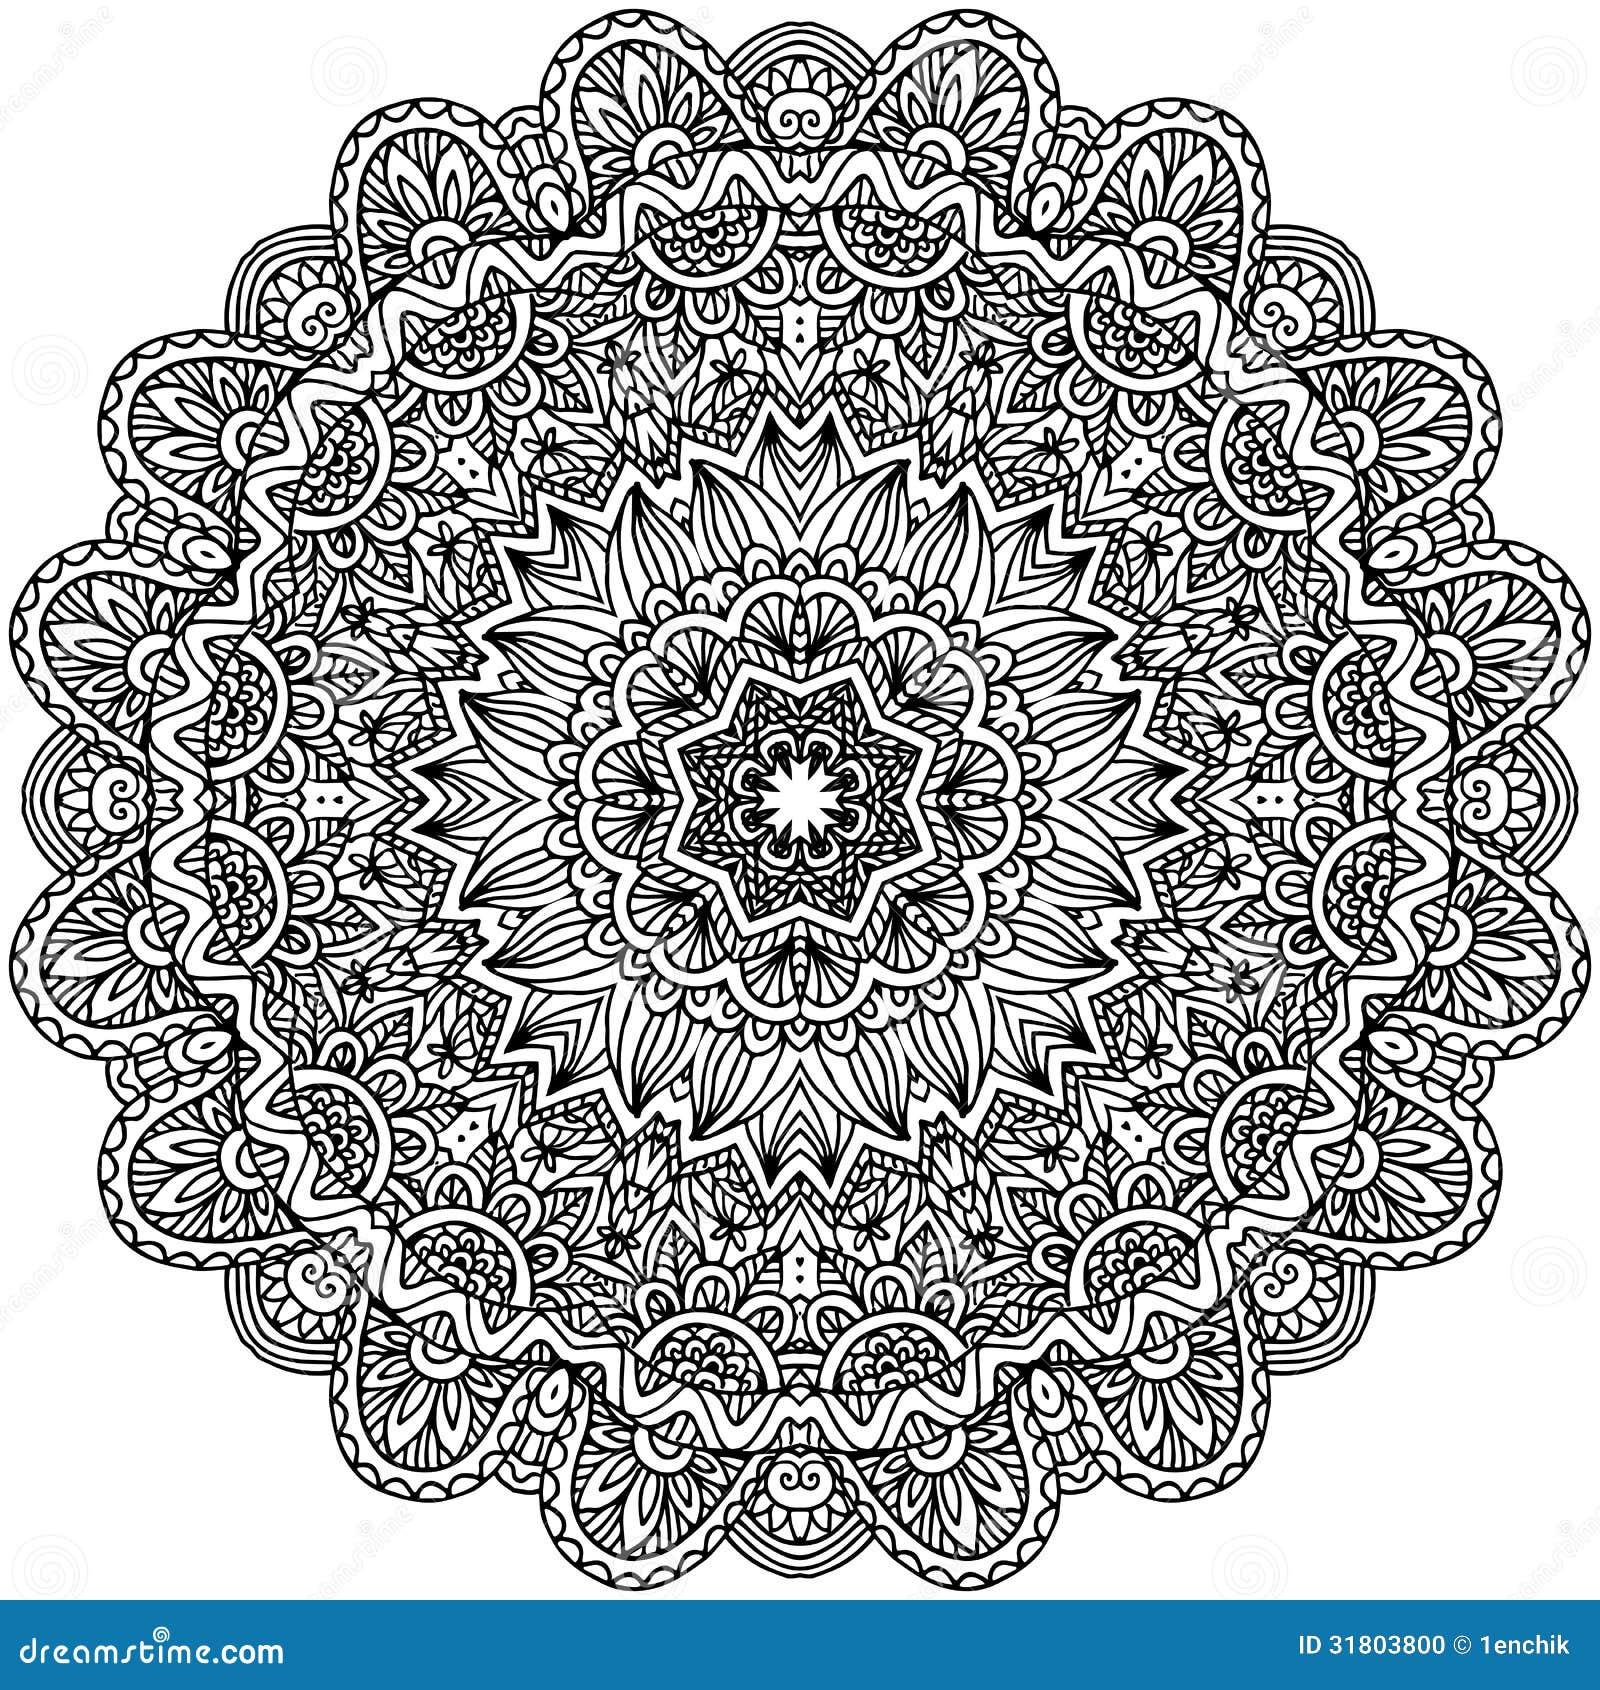 Lacy Ornate Vector Black Napkin Stock Photo Image 31803800